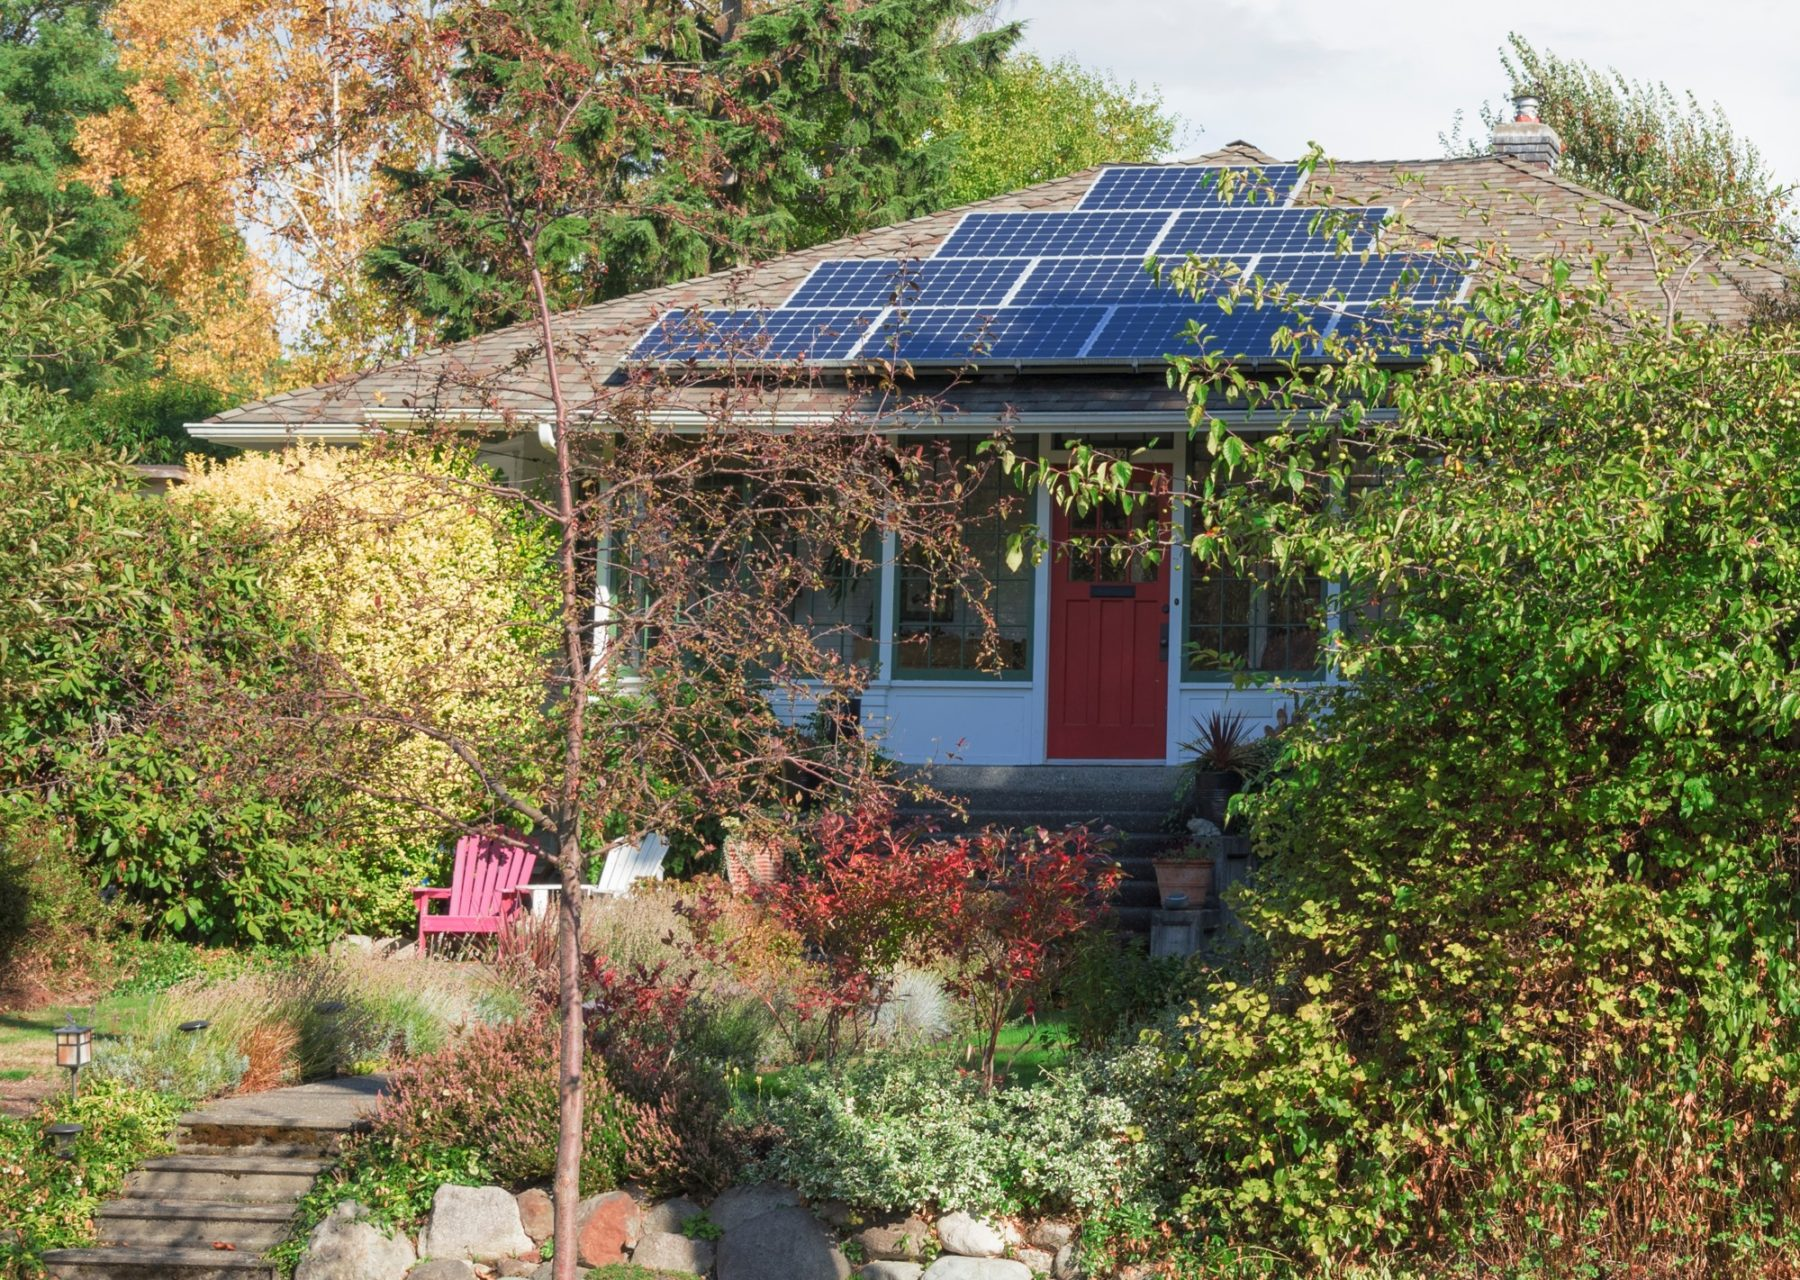 Pondering Solar Panels Best Roof Types For Solar Panel